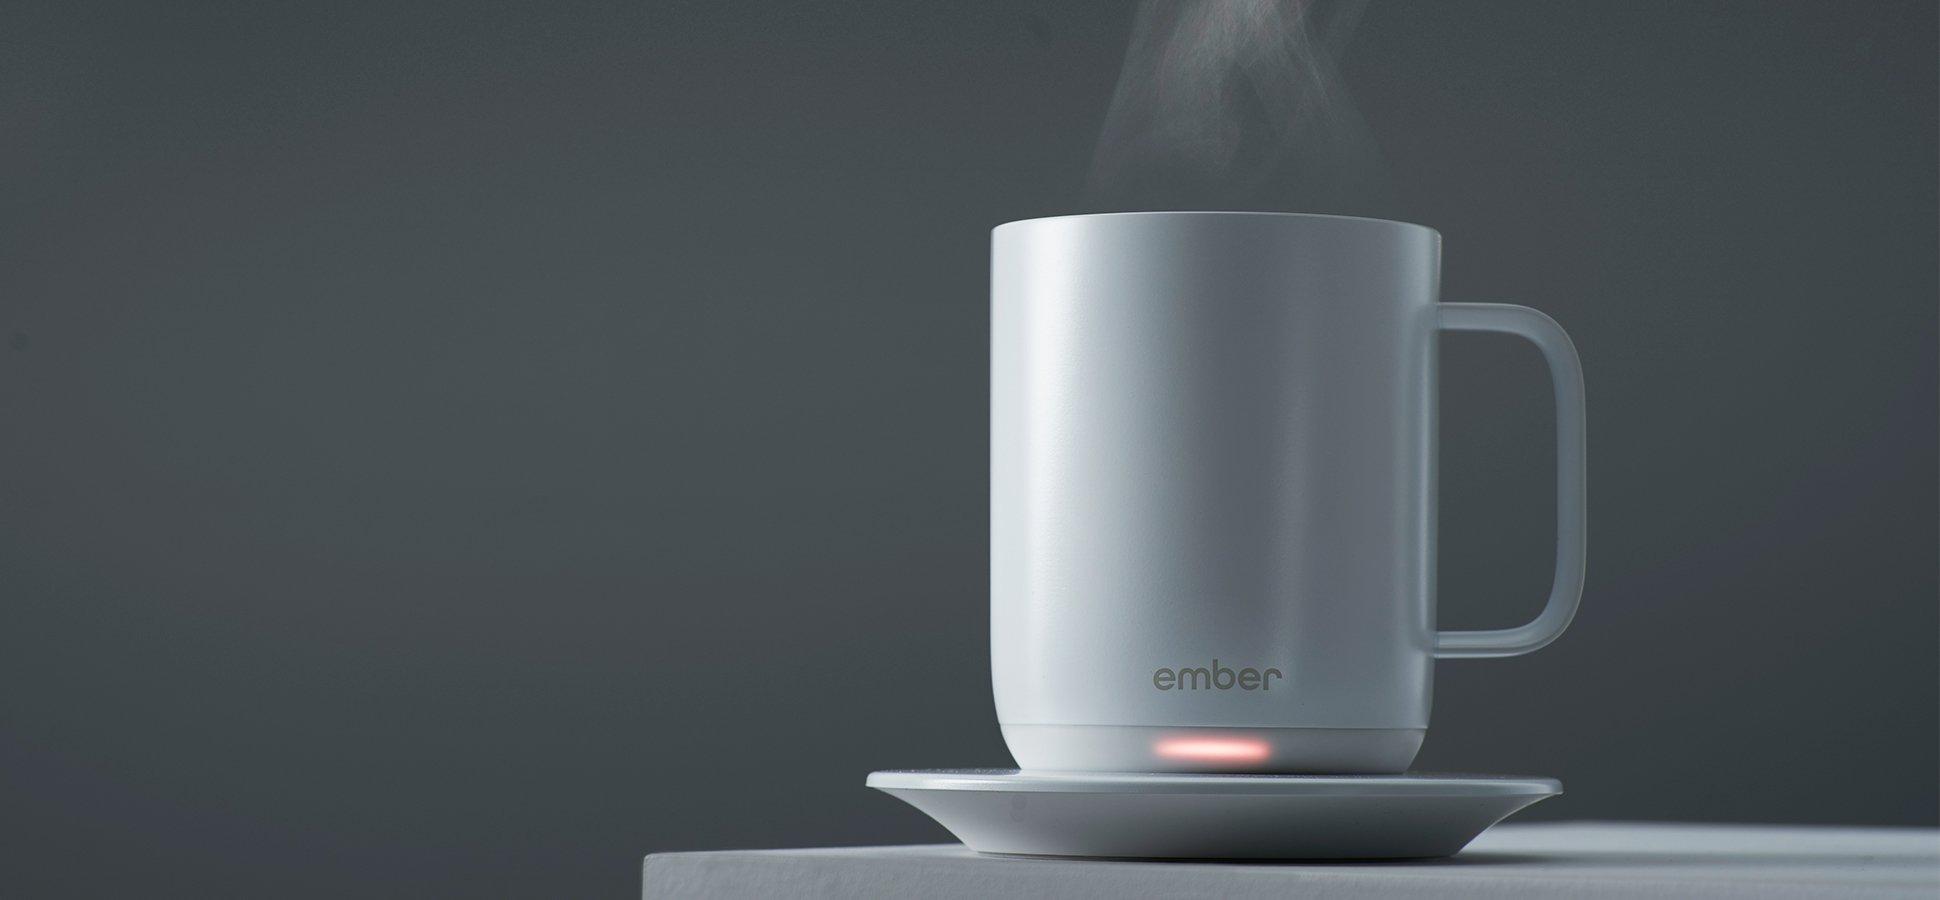 Glomorous Starbucks Is Now Selling Ceramic Ember Mug Futuristic Coffee Mug furniture Futuristic Coffee Mug